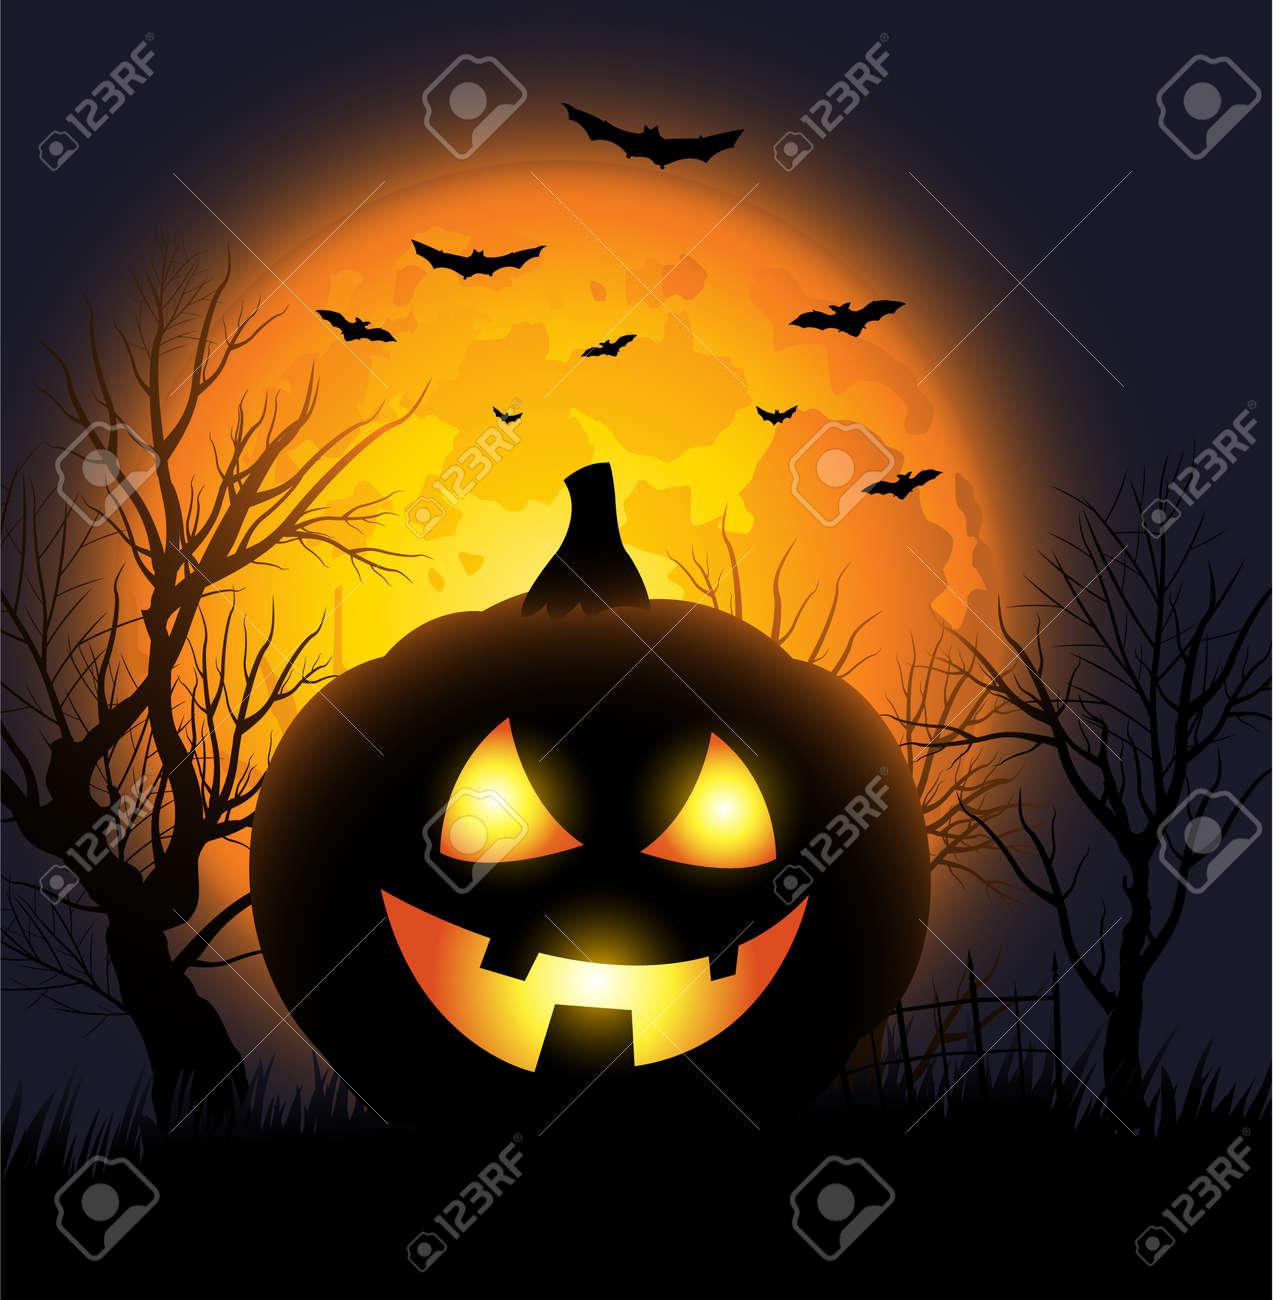 scary jack o lantern face halloween background royalty free